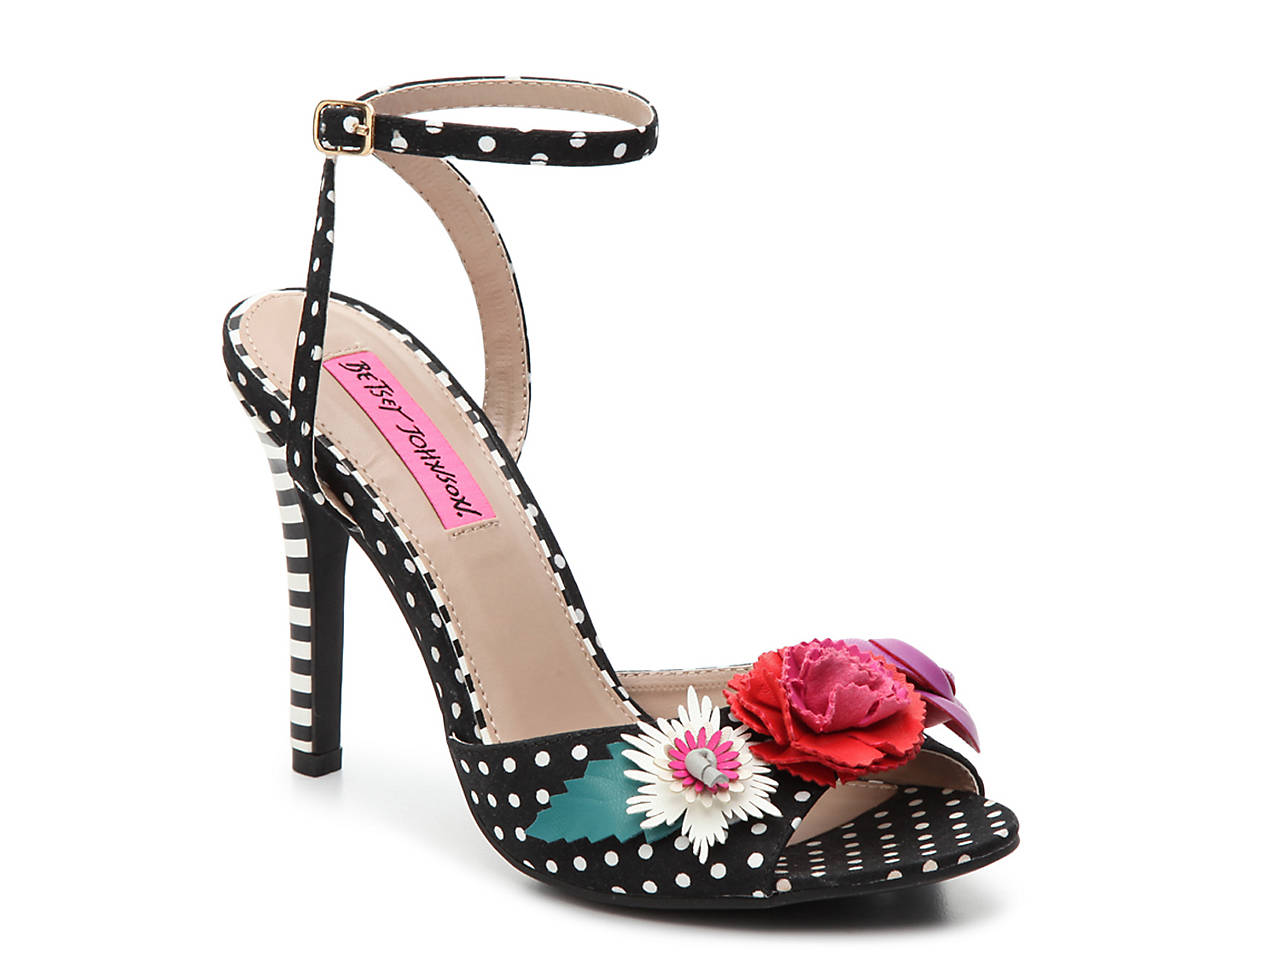 b0caa8a789 Betsey Johnson Jamie Sandal Women s Shoes